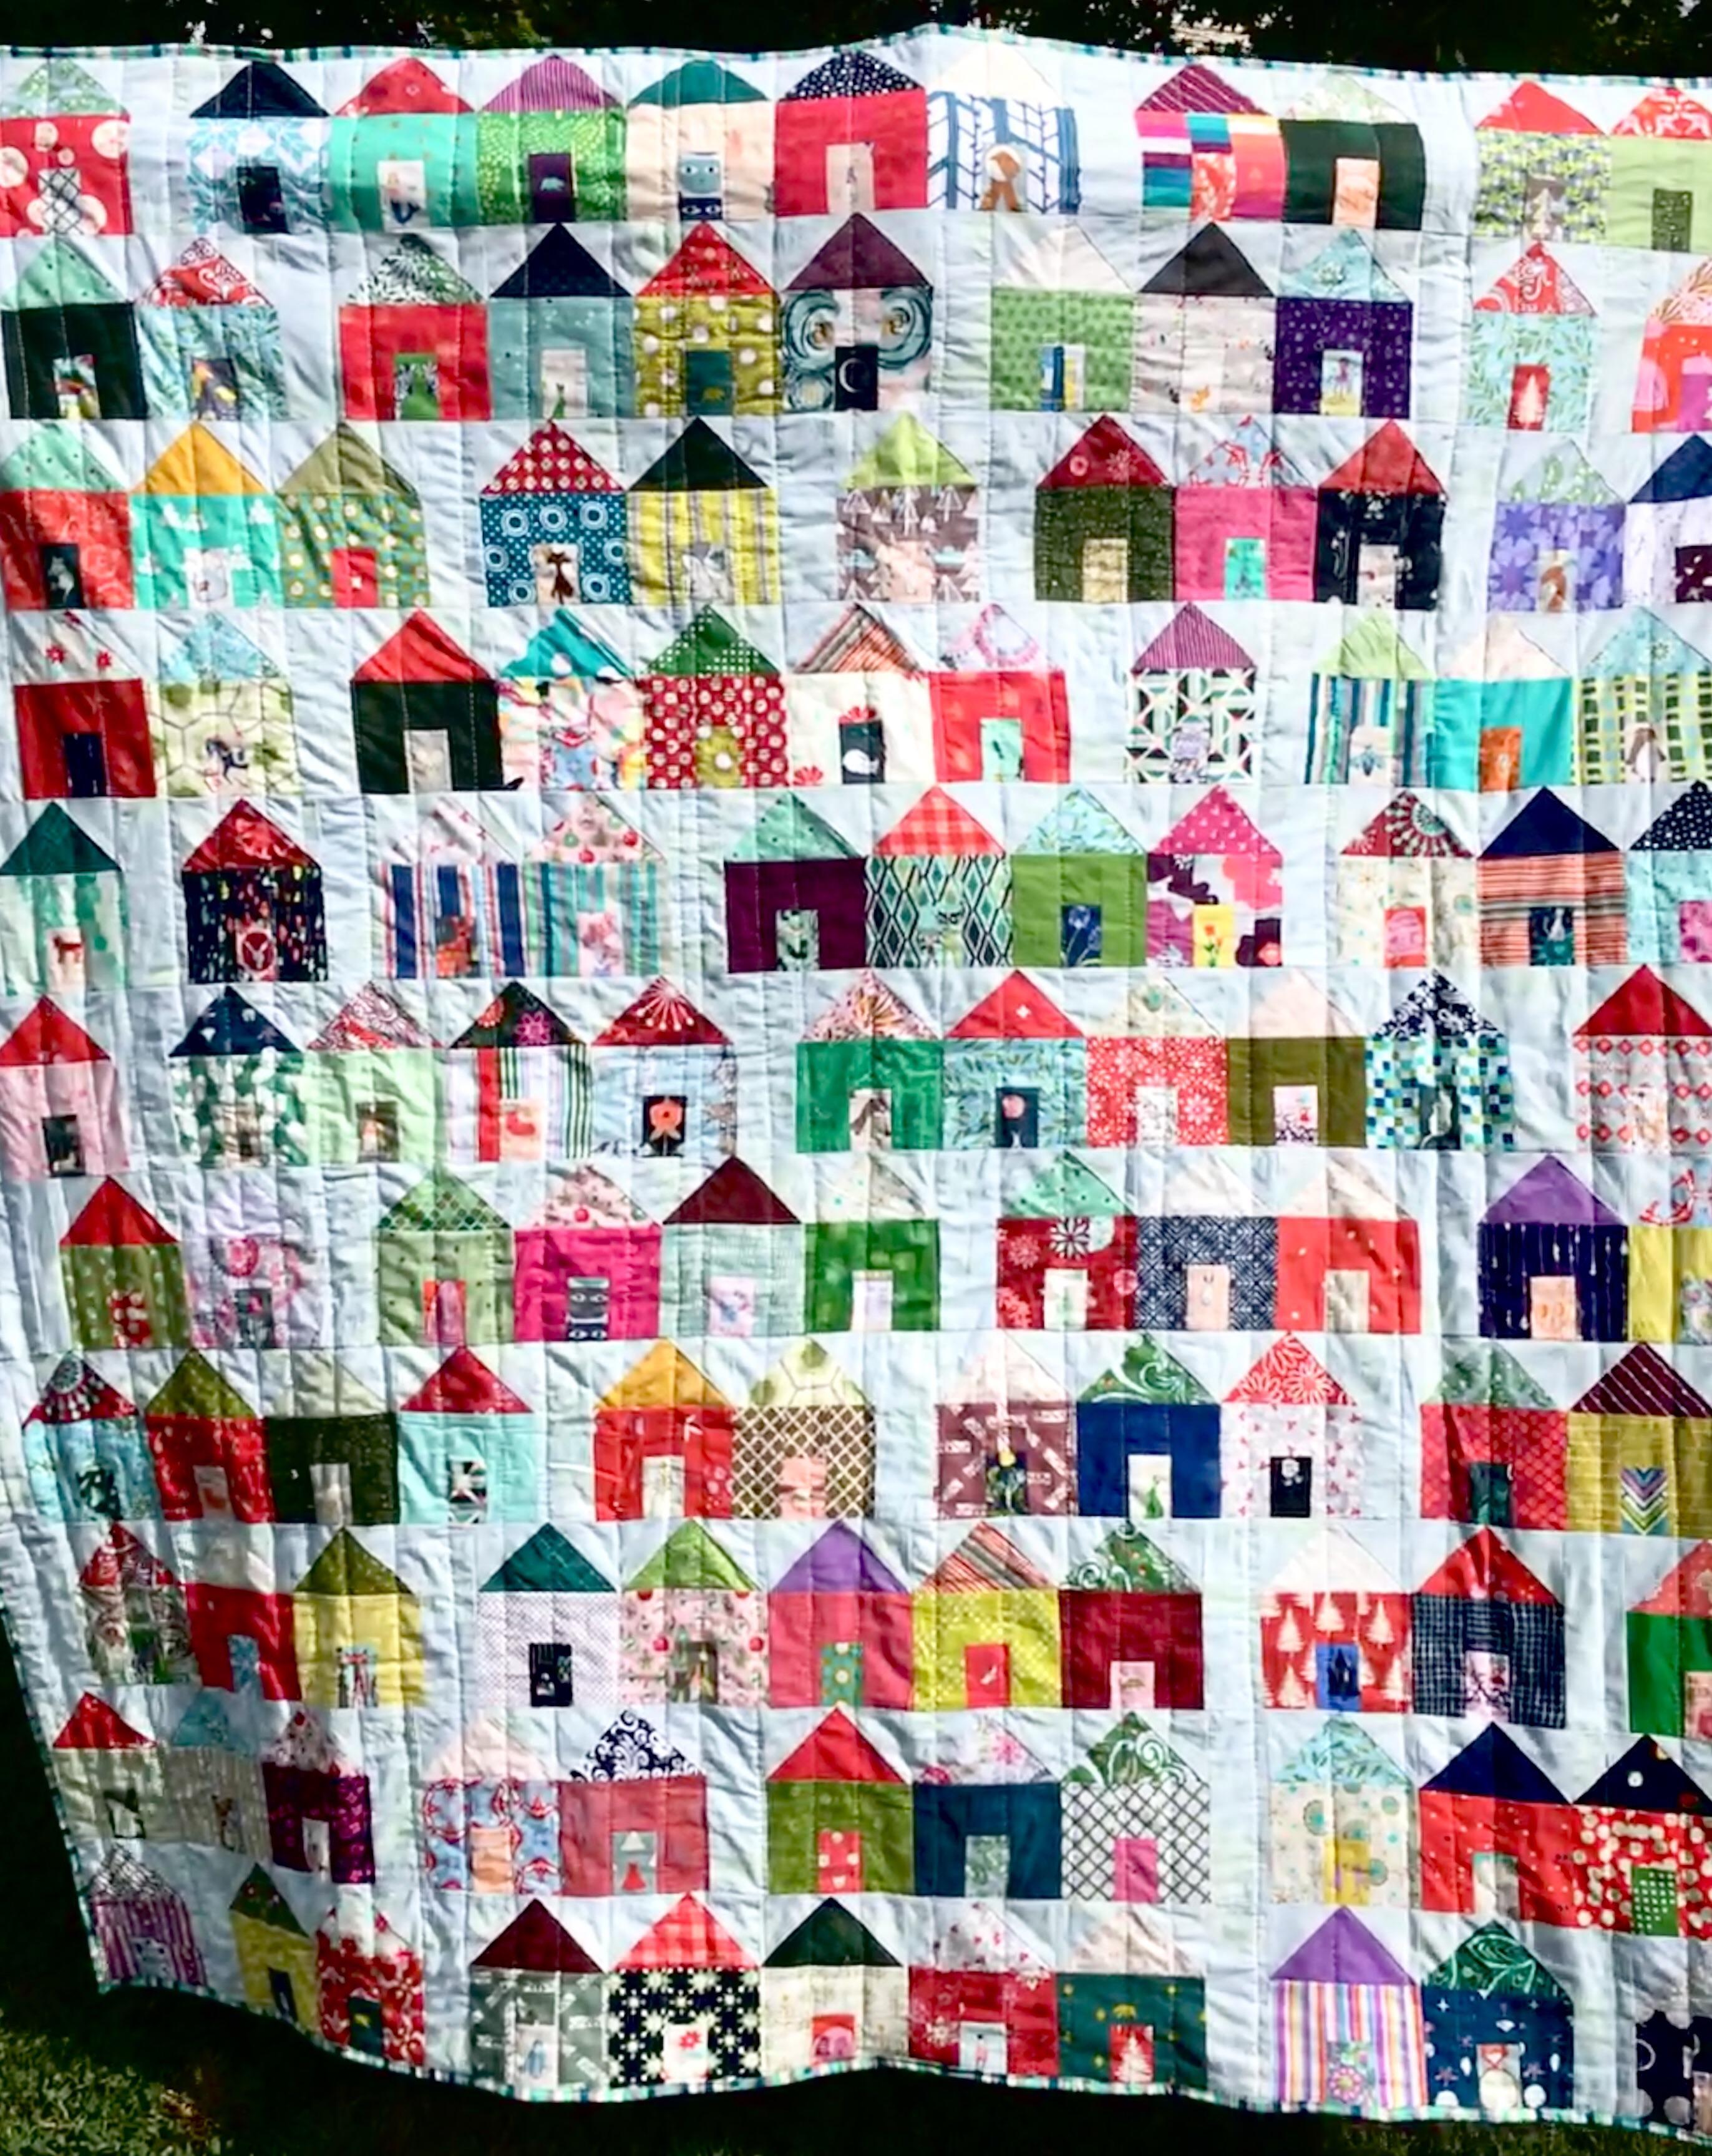 Tiny Houses Quilt Pattern : houses, quilt, pattern, Little, Houses, Quilt, Pattern, Burnsocial